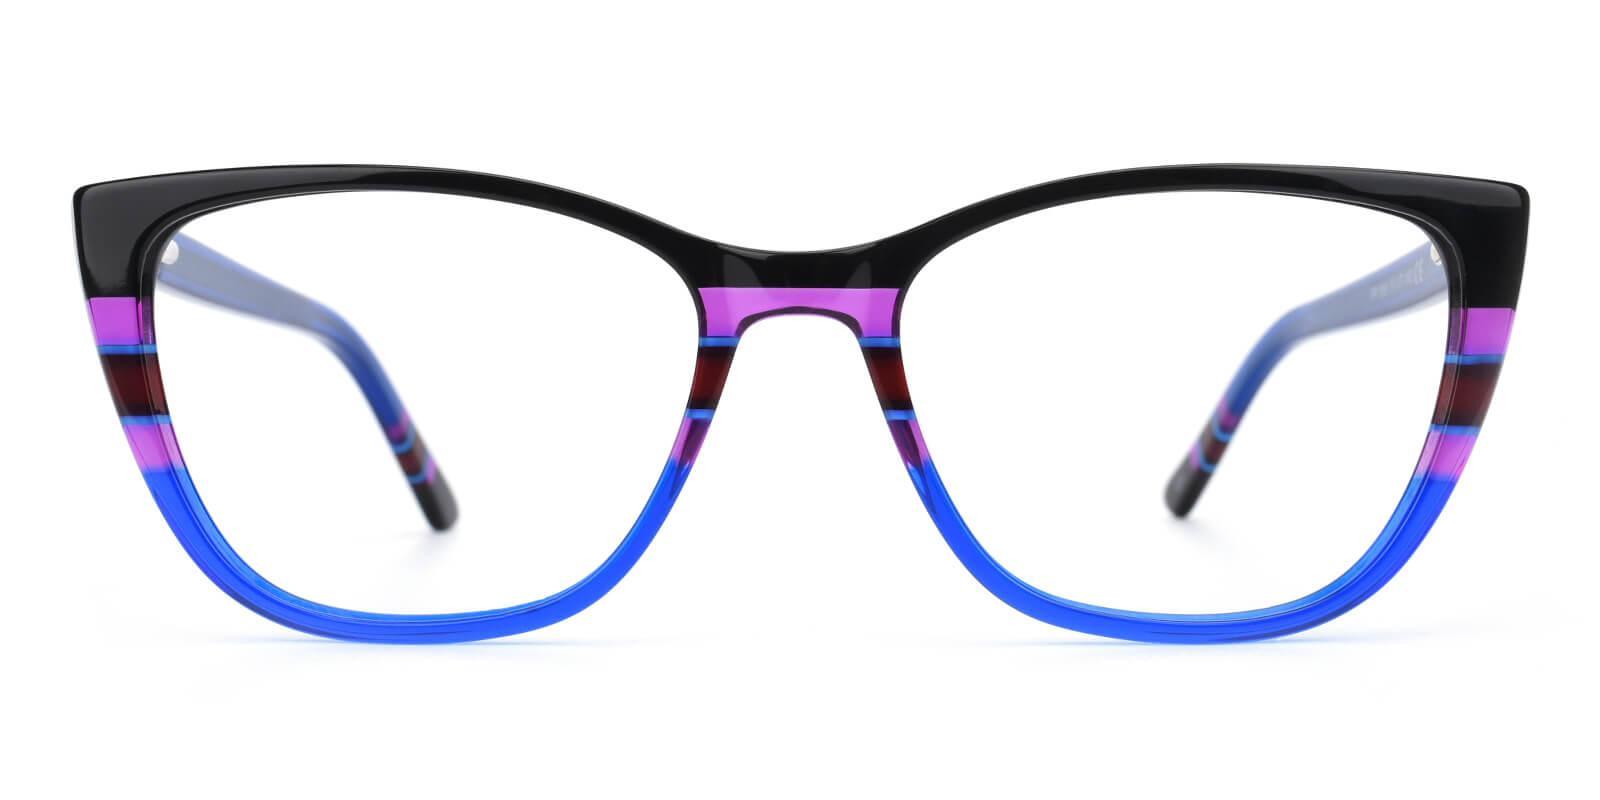 Bblythe-Blue-Cat-Acetate-Eyeglasses-additional2